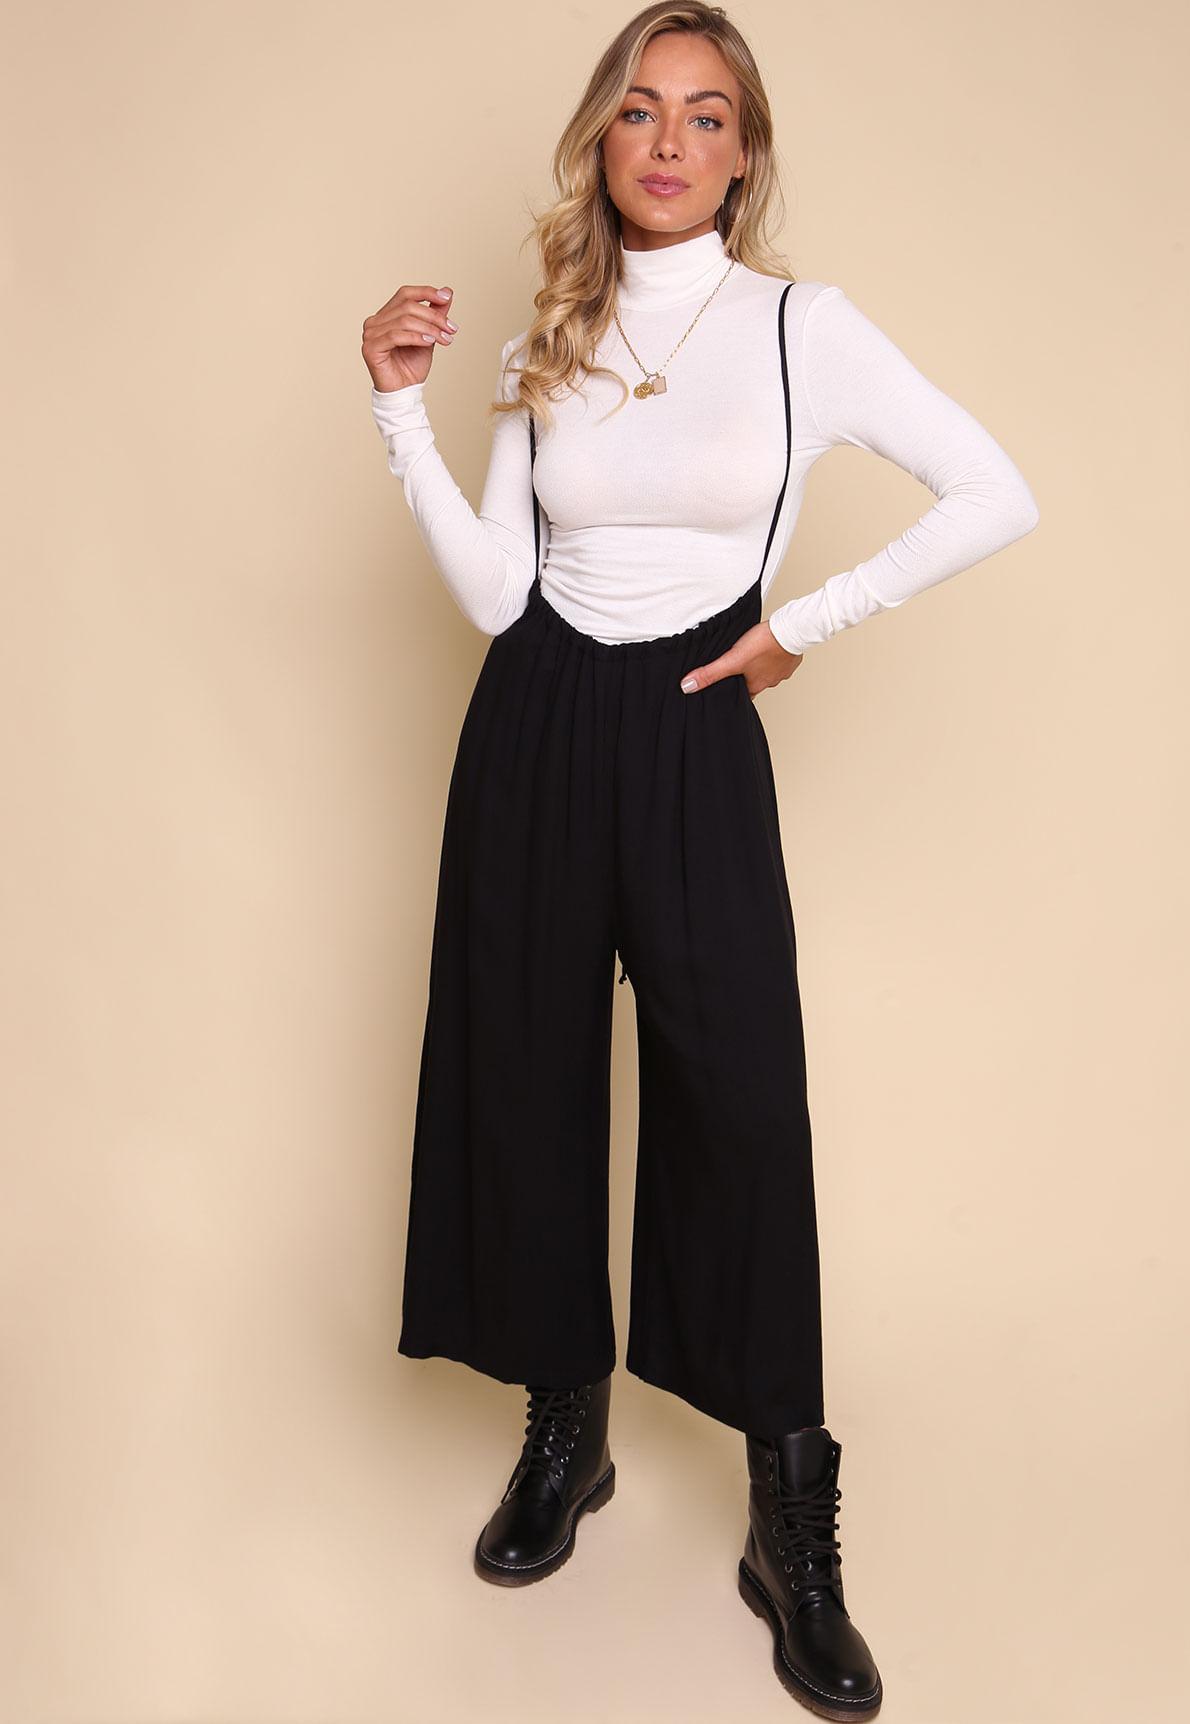 30485-macacao-pantalona-preto-raissa-mundo-lolita-01